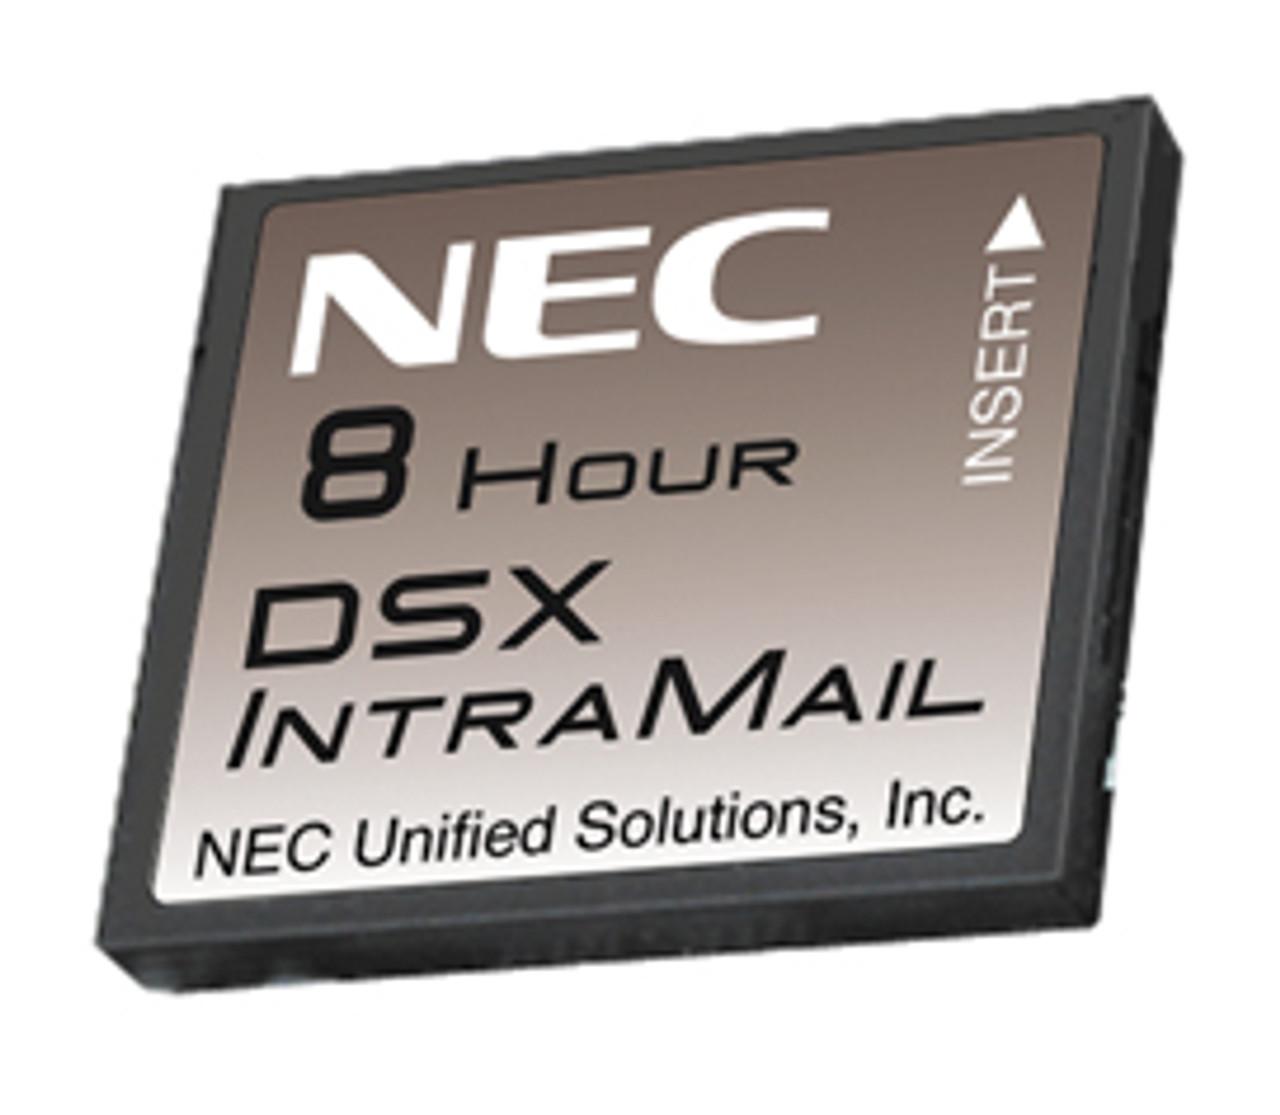 DSX IntraMail 4-Port/8-Hour Voice Mail